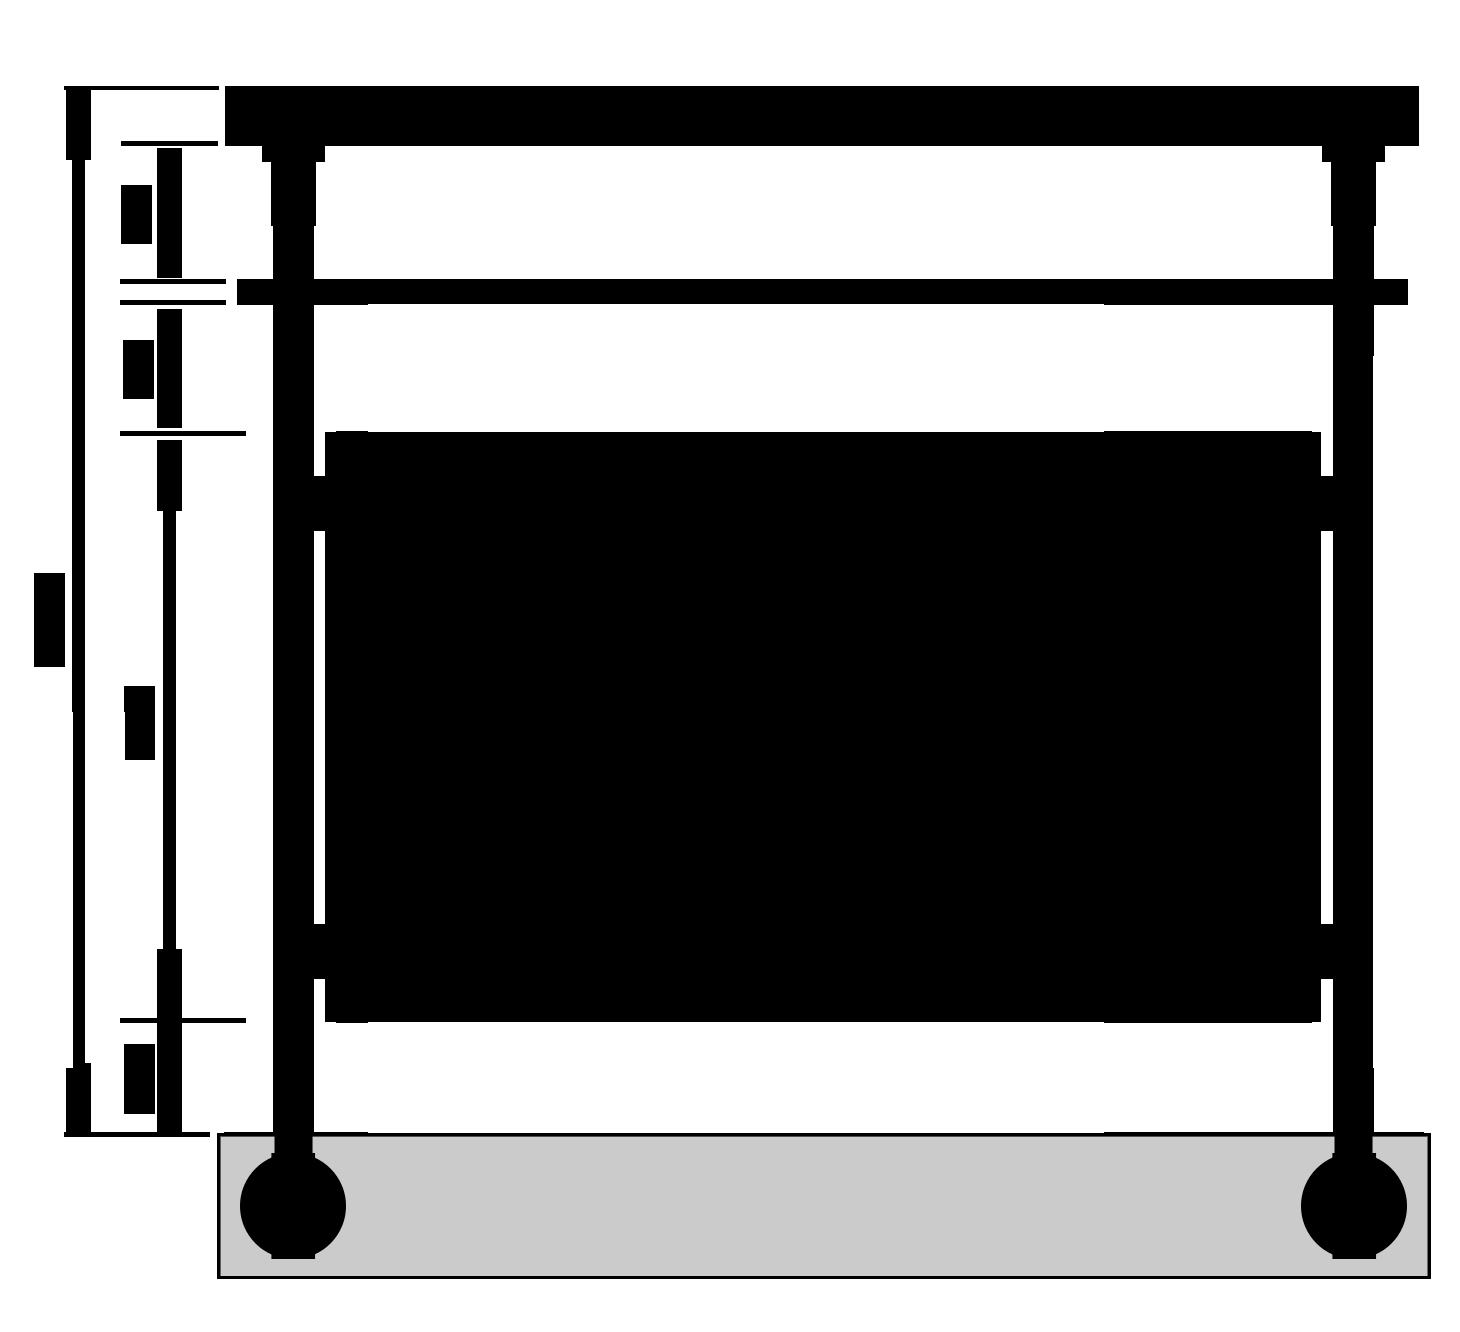 garde corps alu finition inox avec remplissage 4 lisses. Black Bedroom Furniture Sets. Home Design Ideas